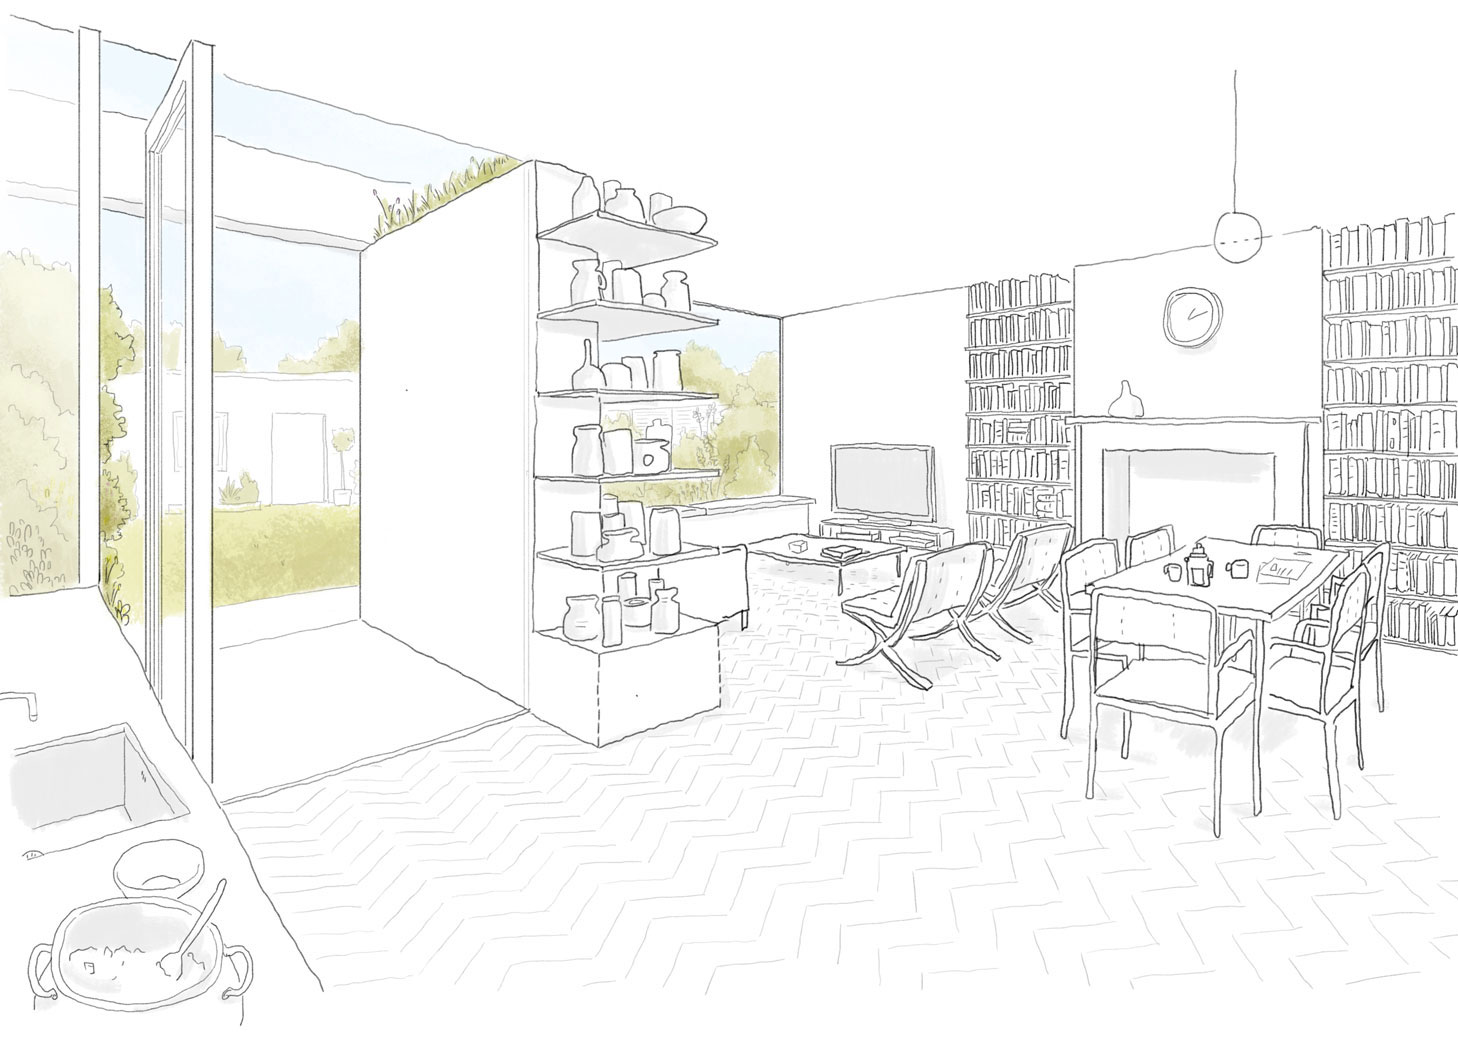 Architecture-London-Design-Freehaus-Residential-Victoria-Road-9.jpg